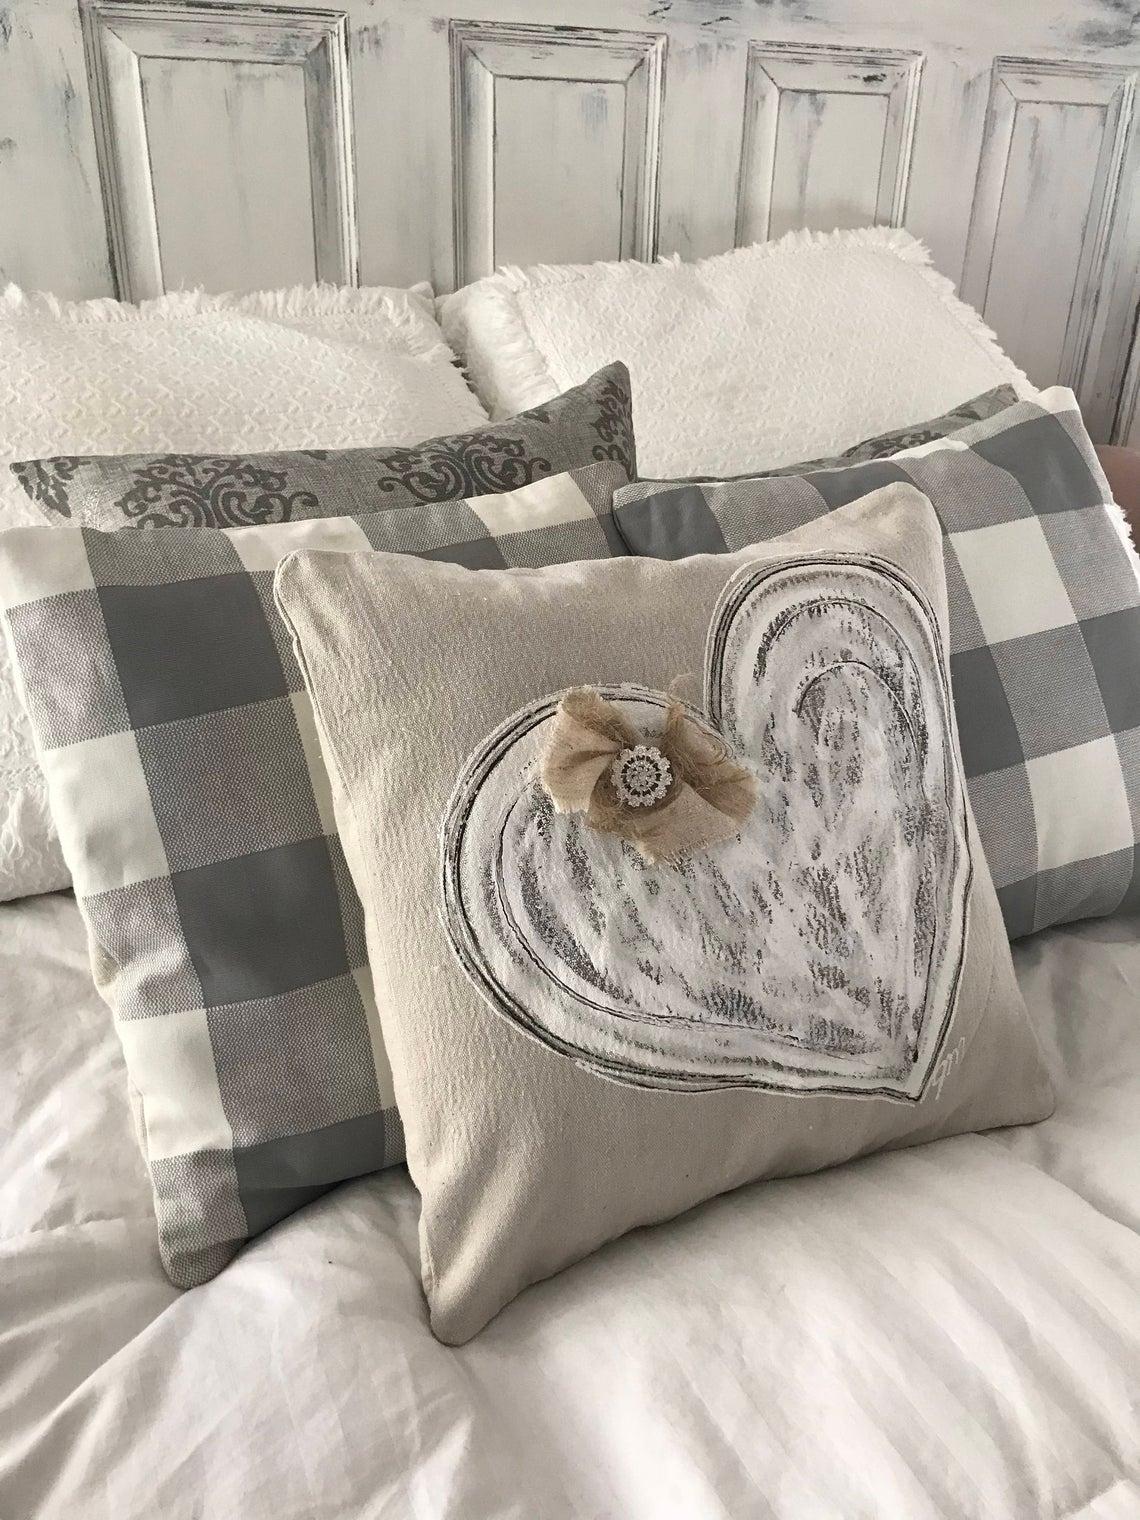 Add more pillows